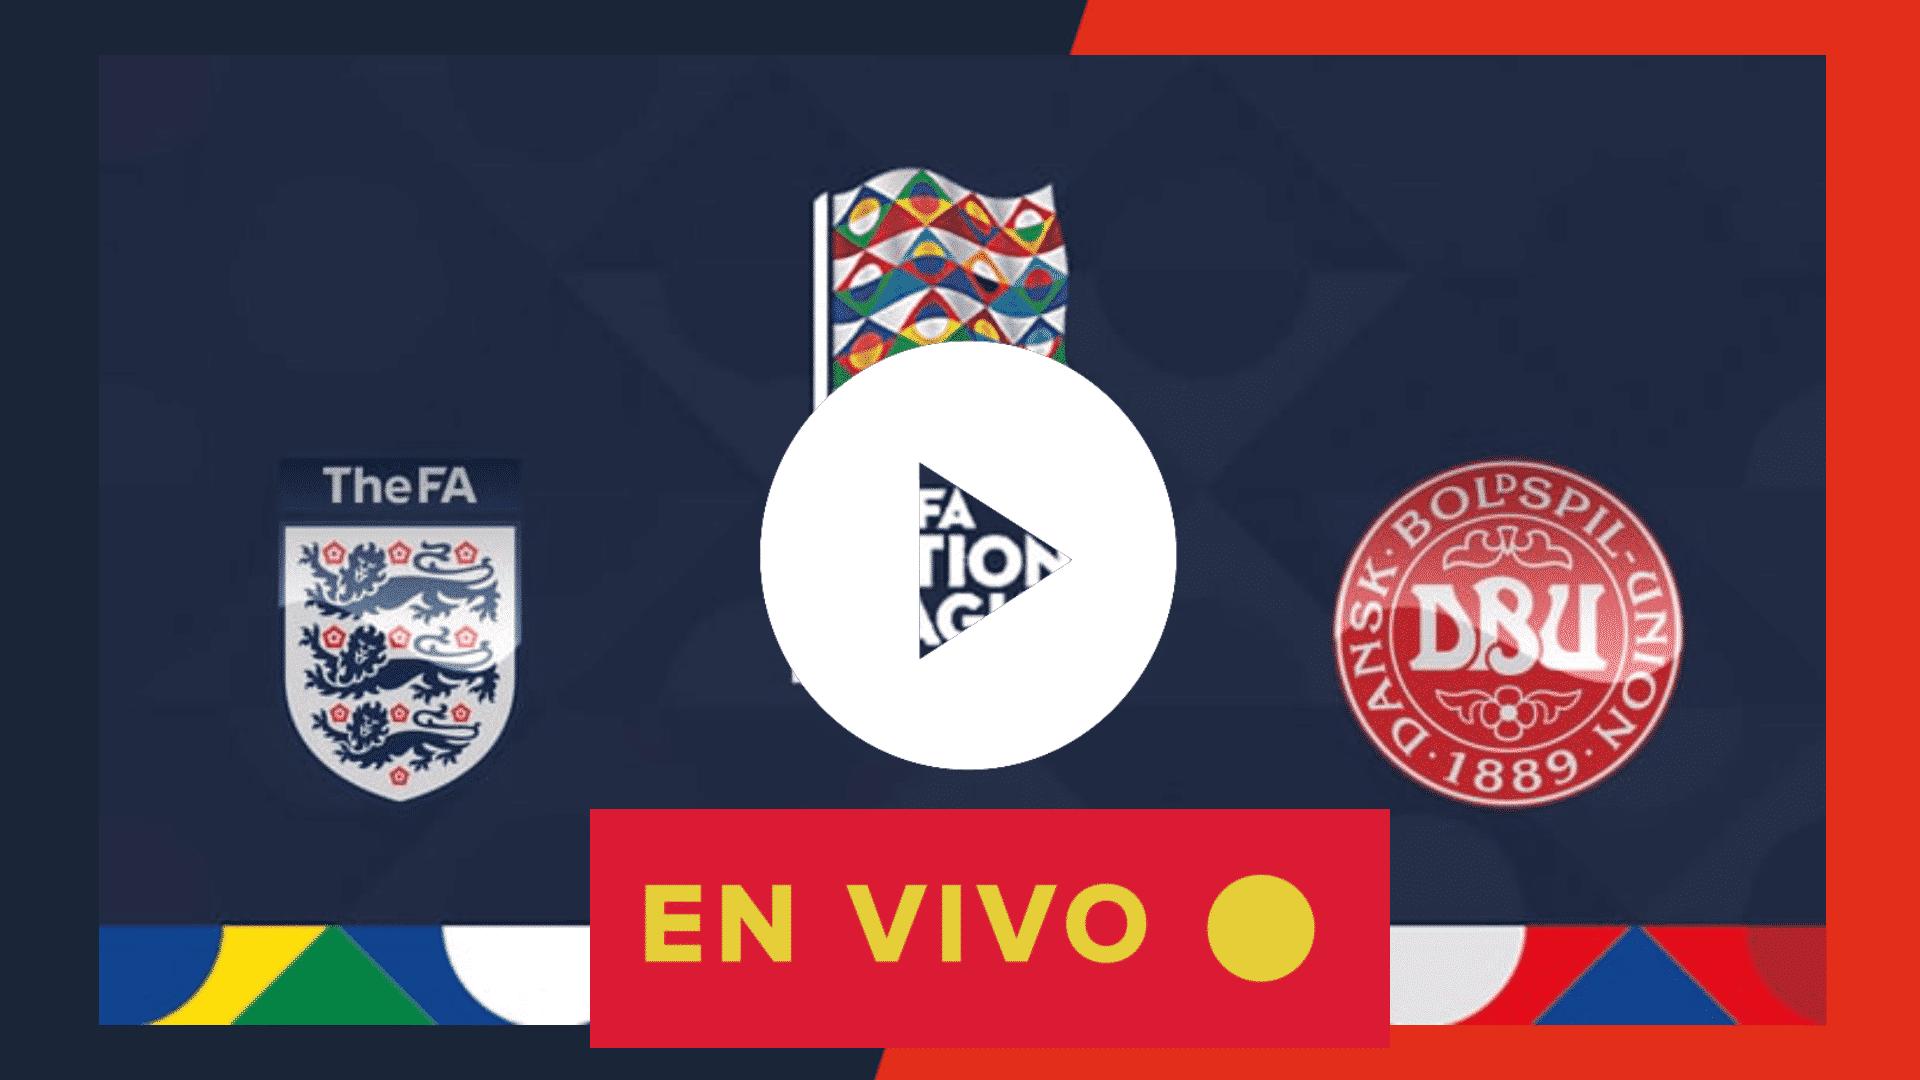 HOY EN VIVO GRATIS ONLINE Inglaterra vs Dinamarca MIRAR AQUI